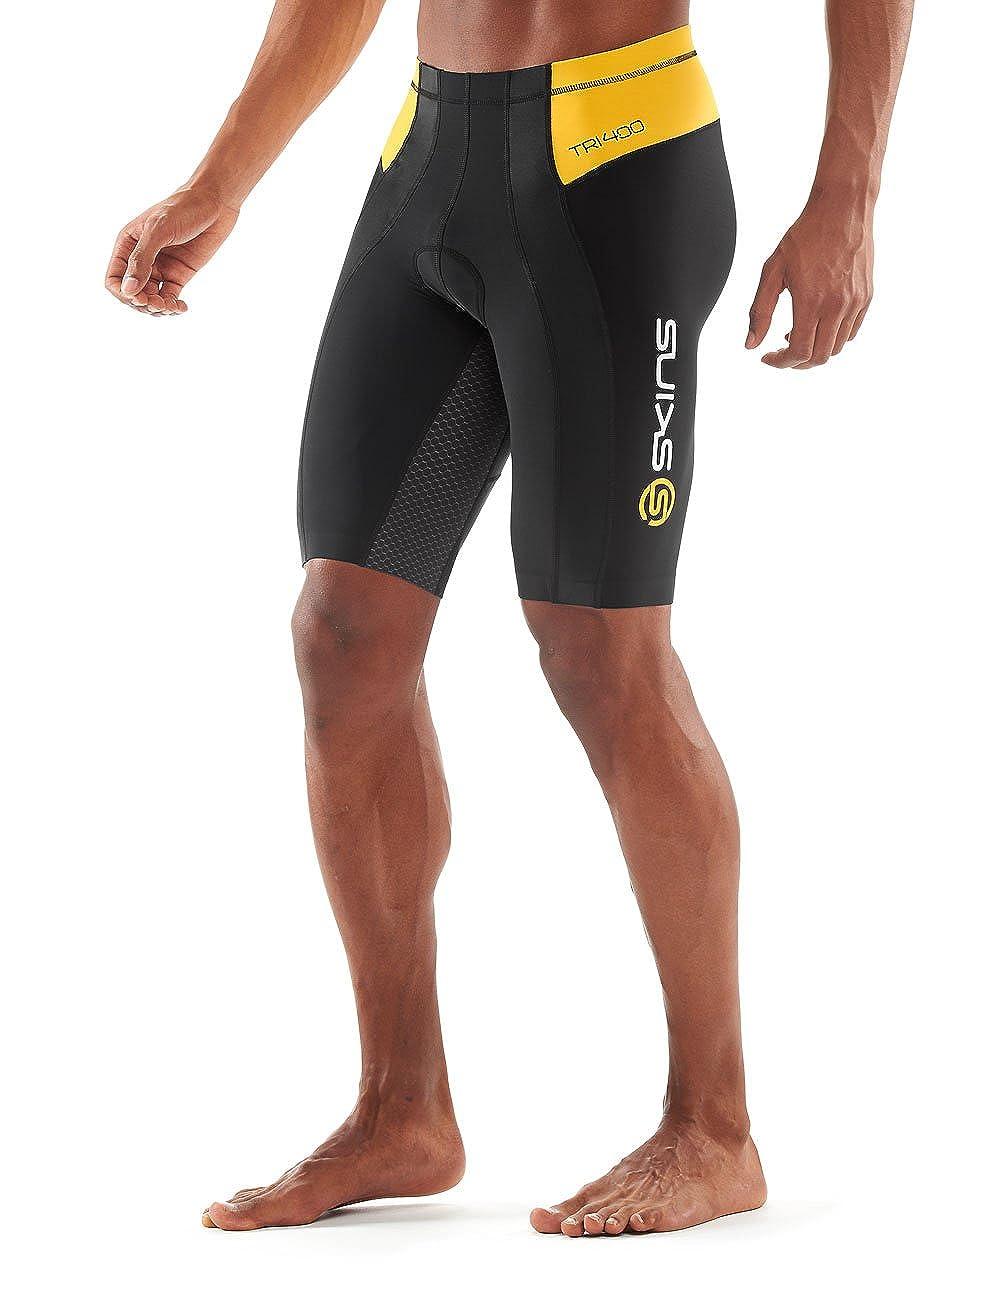 f158cd56da Amazon.com : Skins Men's Tri400 Compression Triathlon Shorts : Clothing